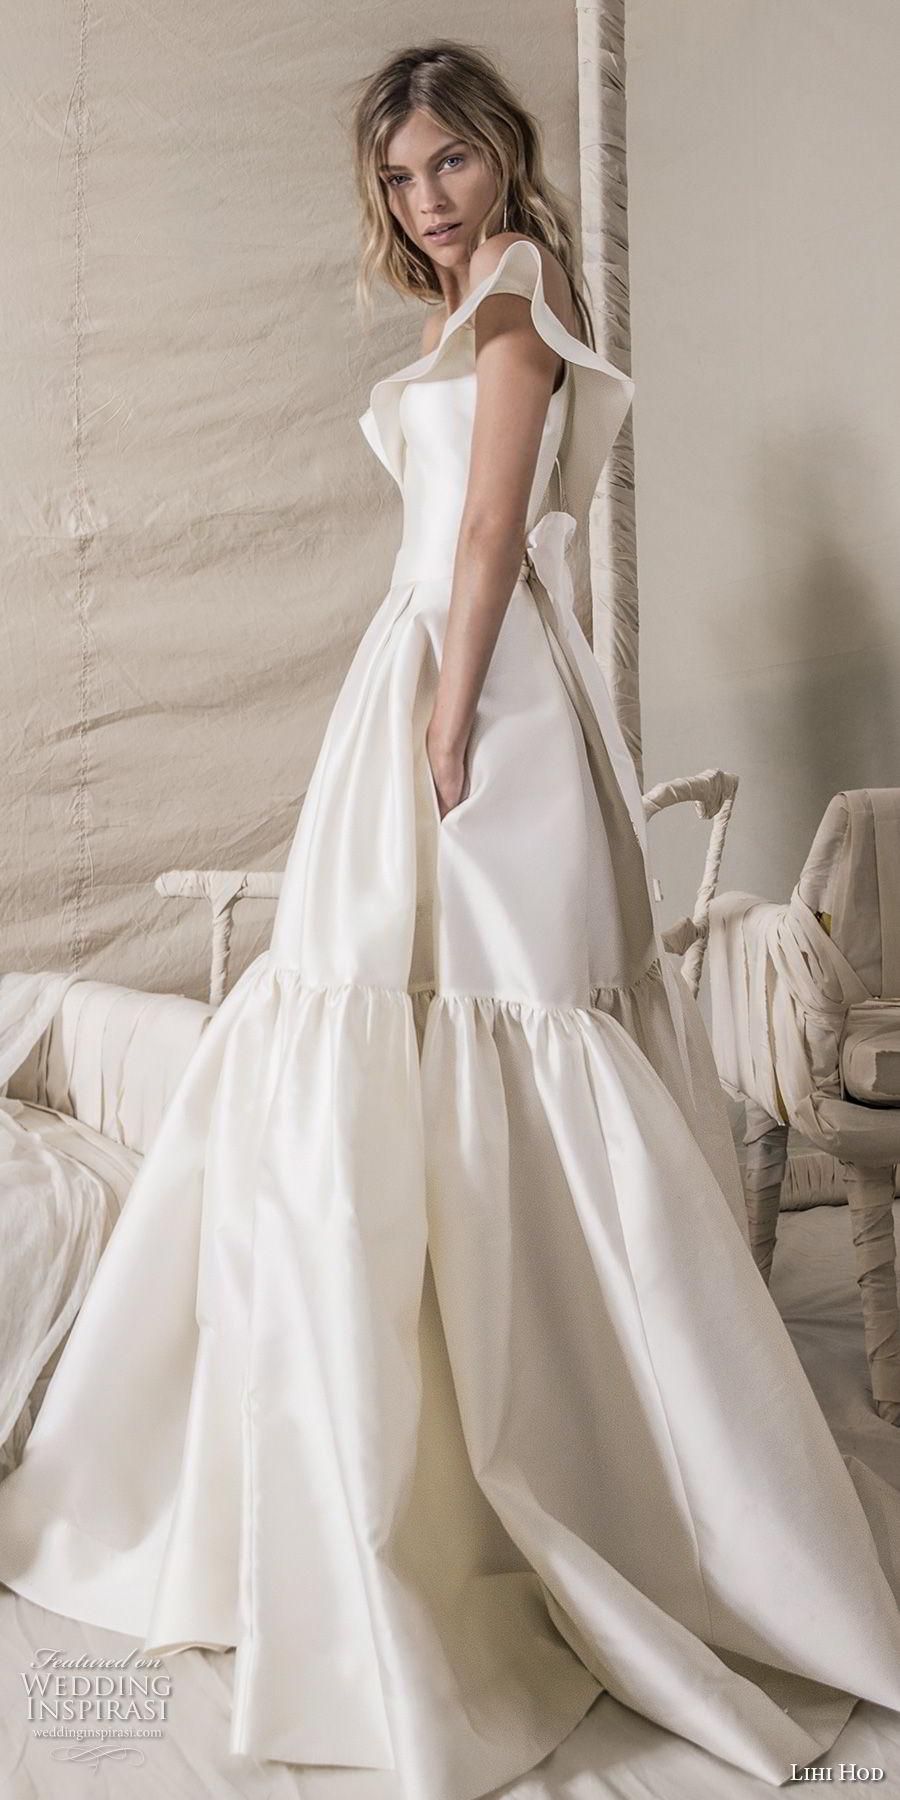 lihi hod 2018 bridal off the shoulder v neck simple clean bodice elegant ball gown a  line wedding dress with pockets chapel train (15) mv sdv